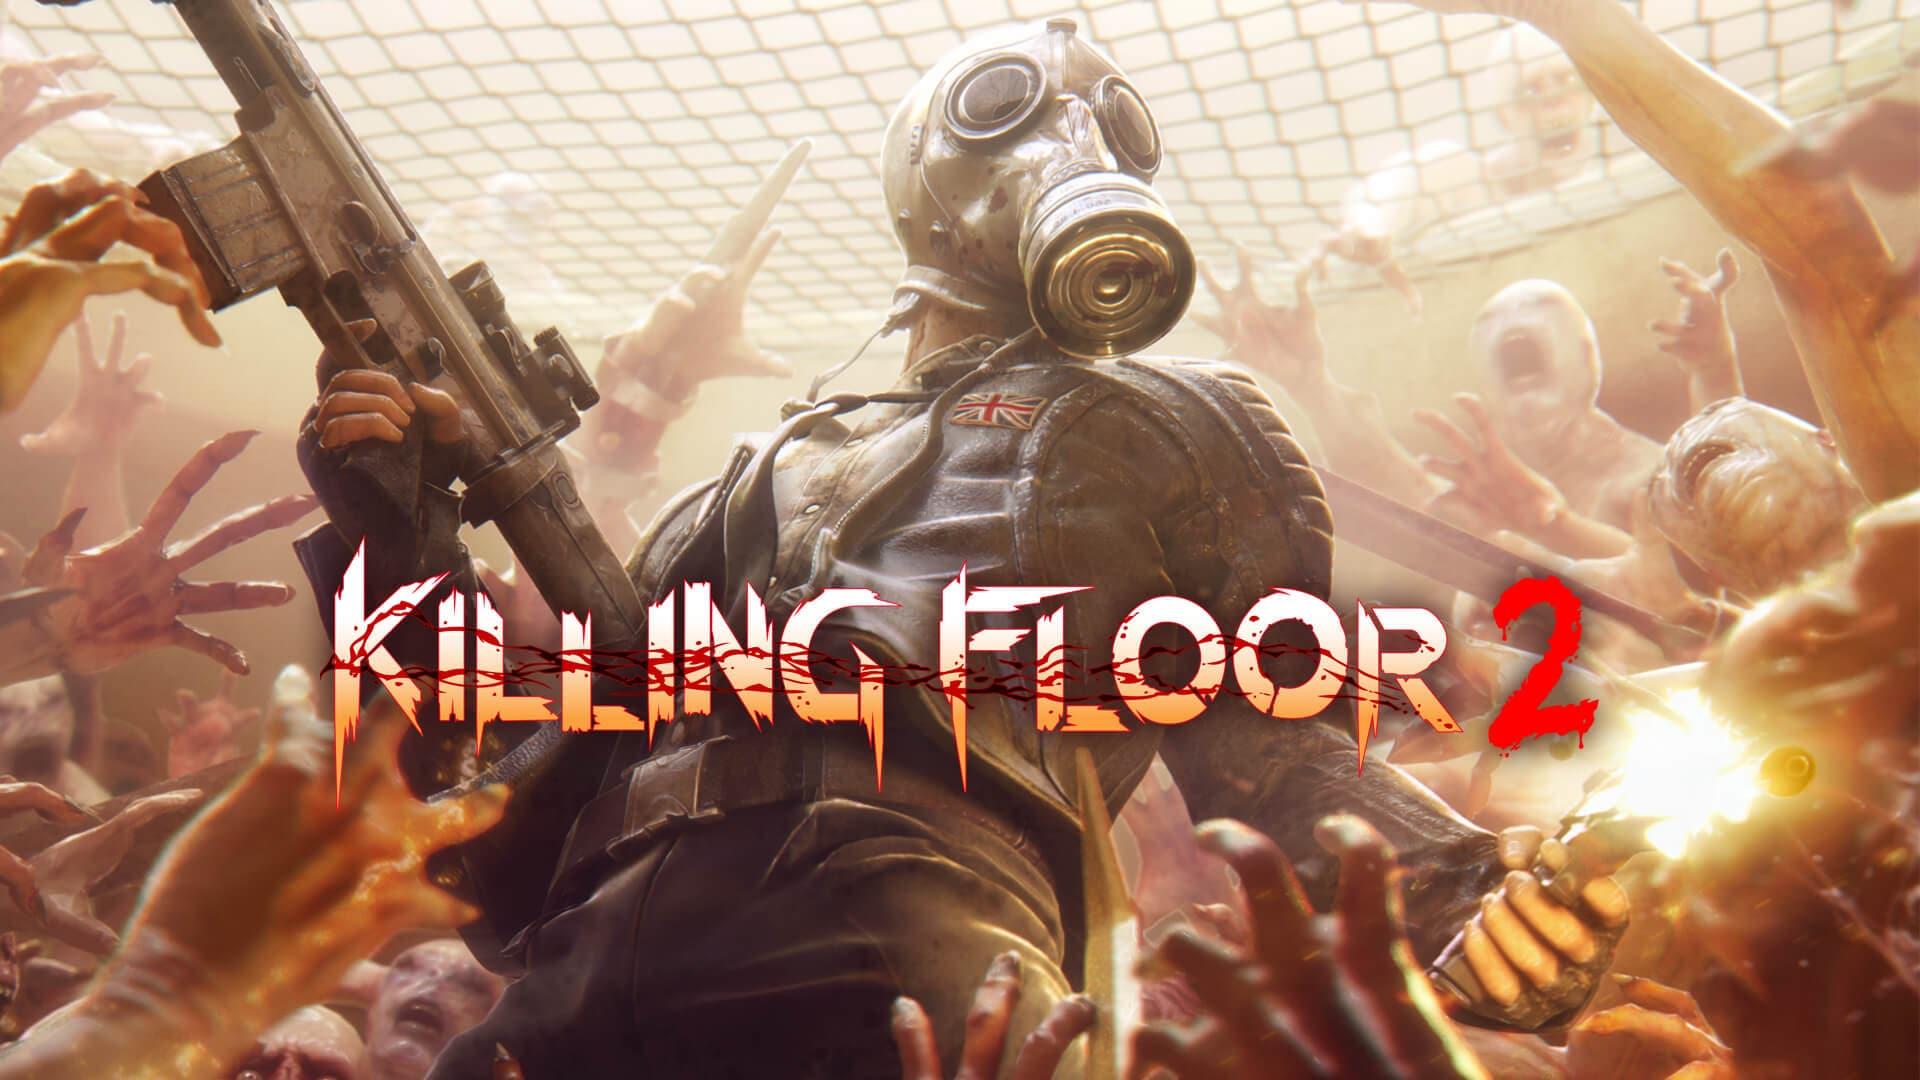 Diesel productv2 killing floor 2 home EGS Killin